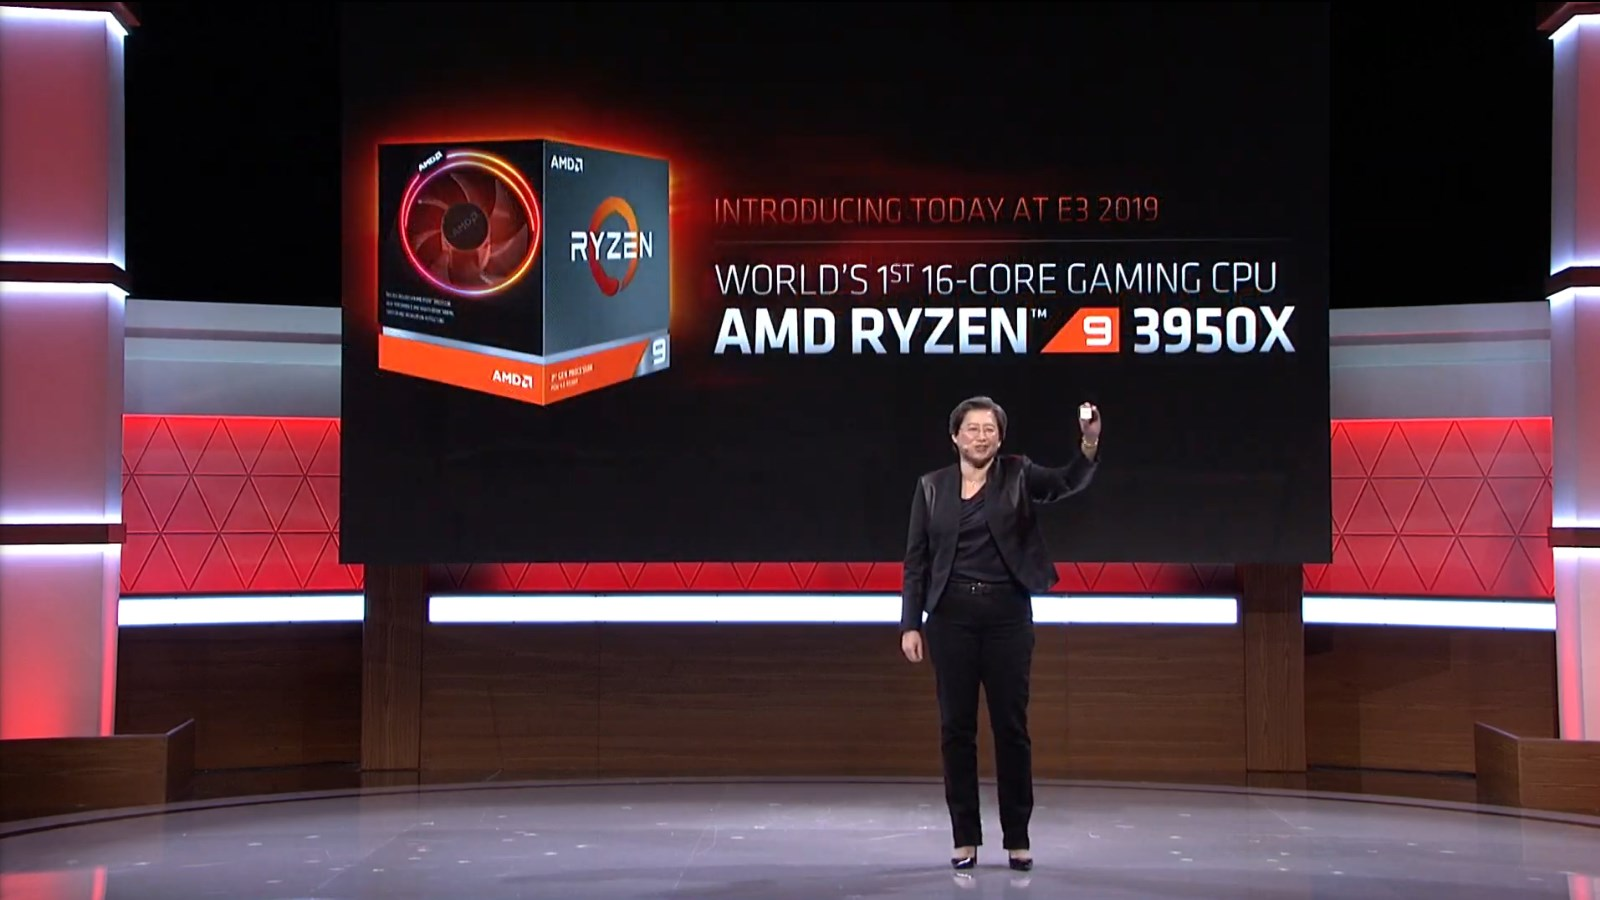 The AMD Ryzen 9 3950X is already breaking world overclocking records